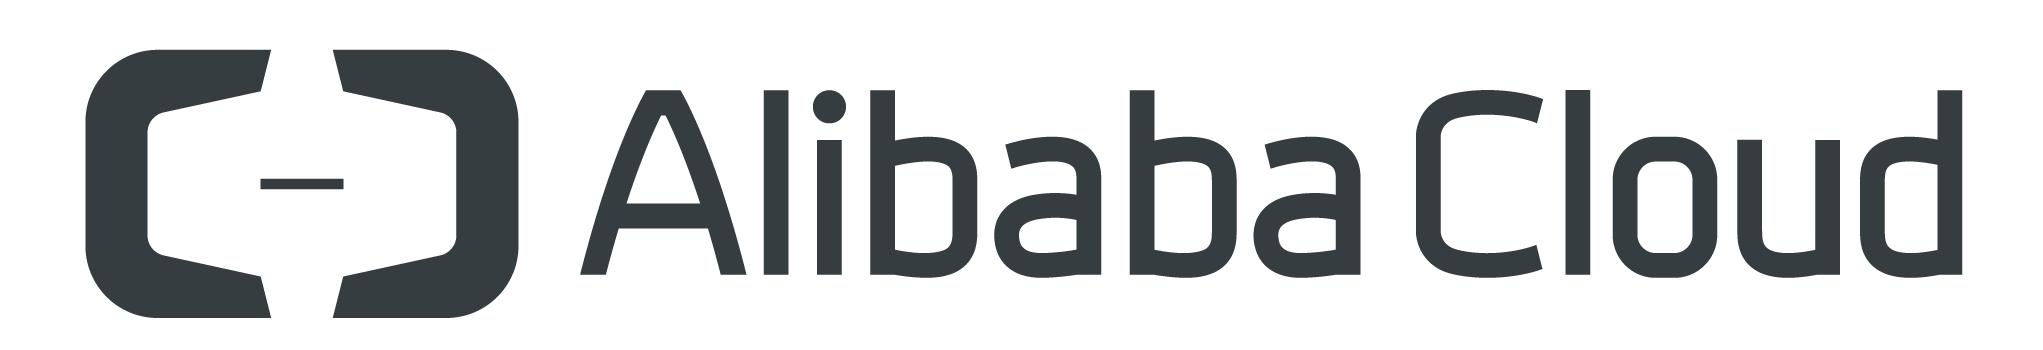 New Logo u2013 A Symbol of Computingu0027s Limitless Value - Alibaba Group Logo PNG